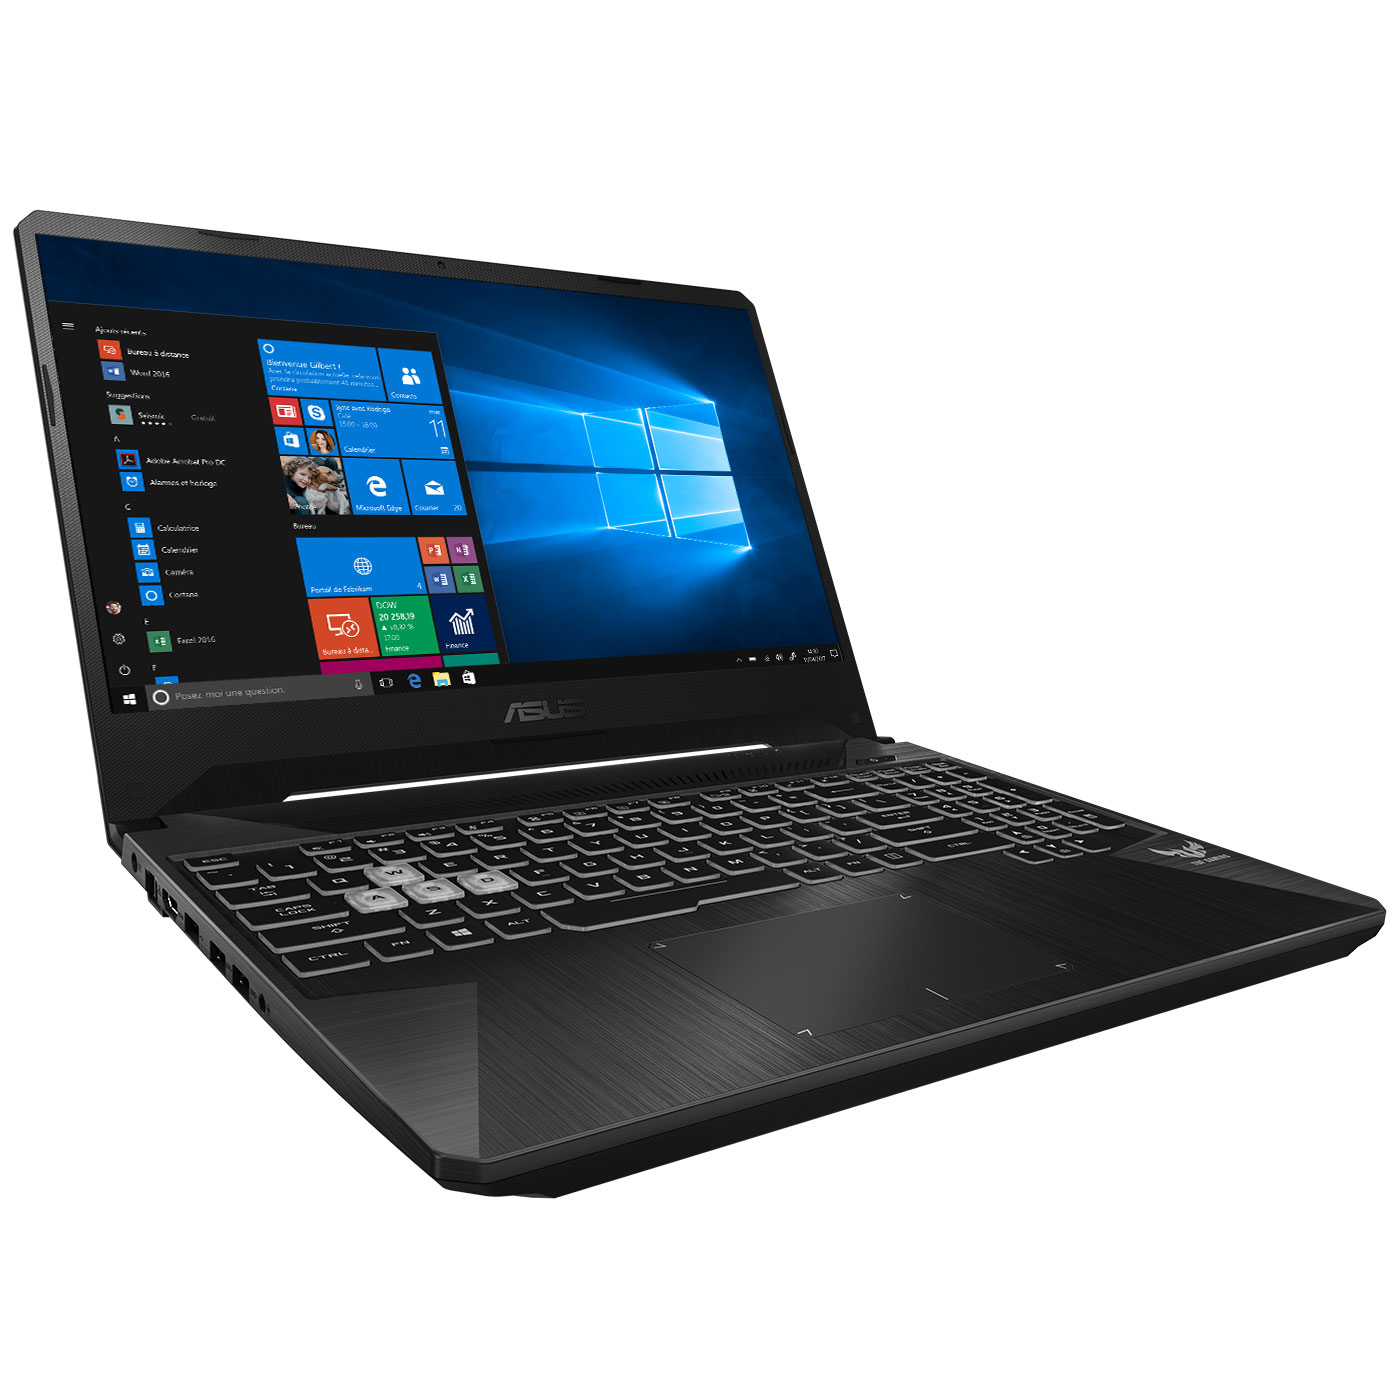 "PC portable ASUS ROG Station PX505GD-BQ106R Intel Core i7-8750H 16 Go SSD 256 Go + HDD 1 To 15.6"" LED Full HD NVIDIA GeForce GTX 1050 4 Go Wi-Fi AC/Bluetooth Webcam Windows 10 Professionnel 64 bits (garantie constructeur 2 ans)"